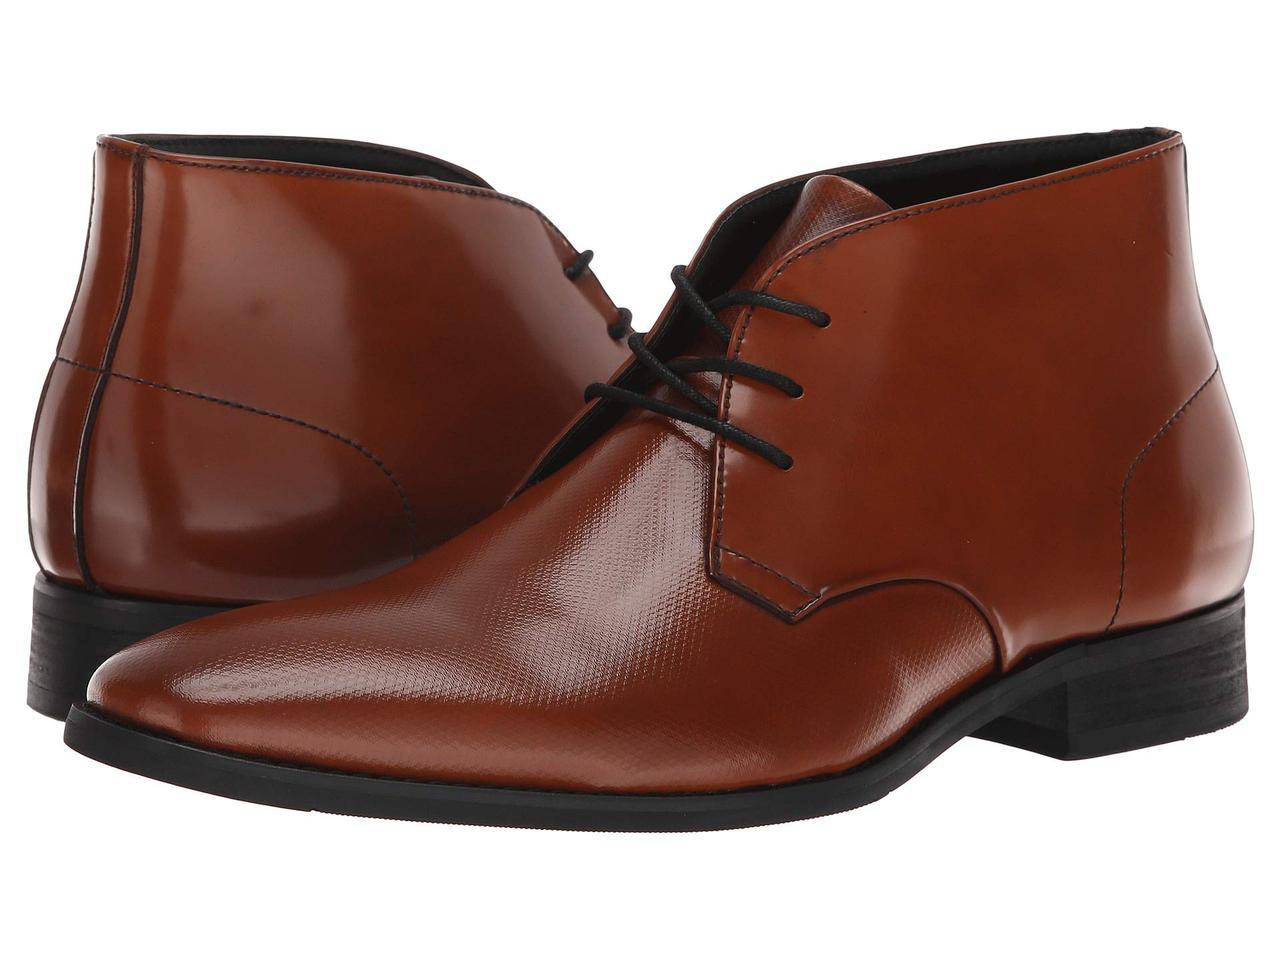 f89dc8556ca7 Ботинки/Сапоги (Оригинал) Calvin Klein Rolando Cognac - Bigl.ua